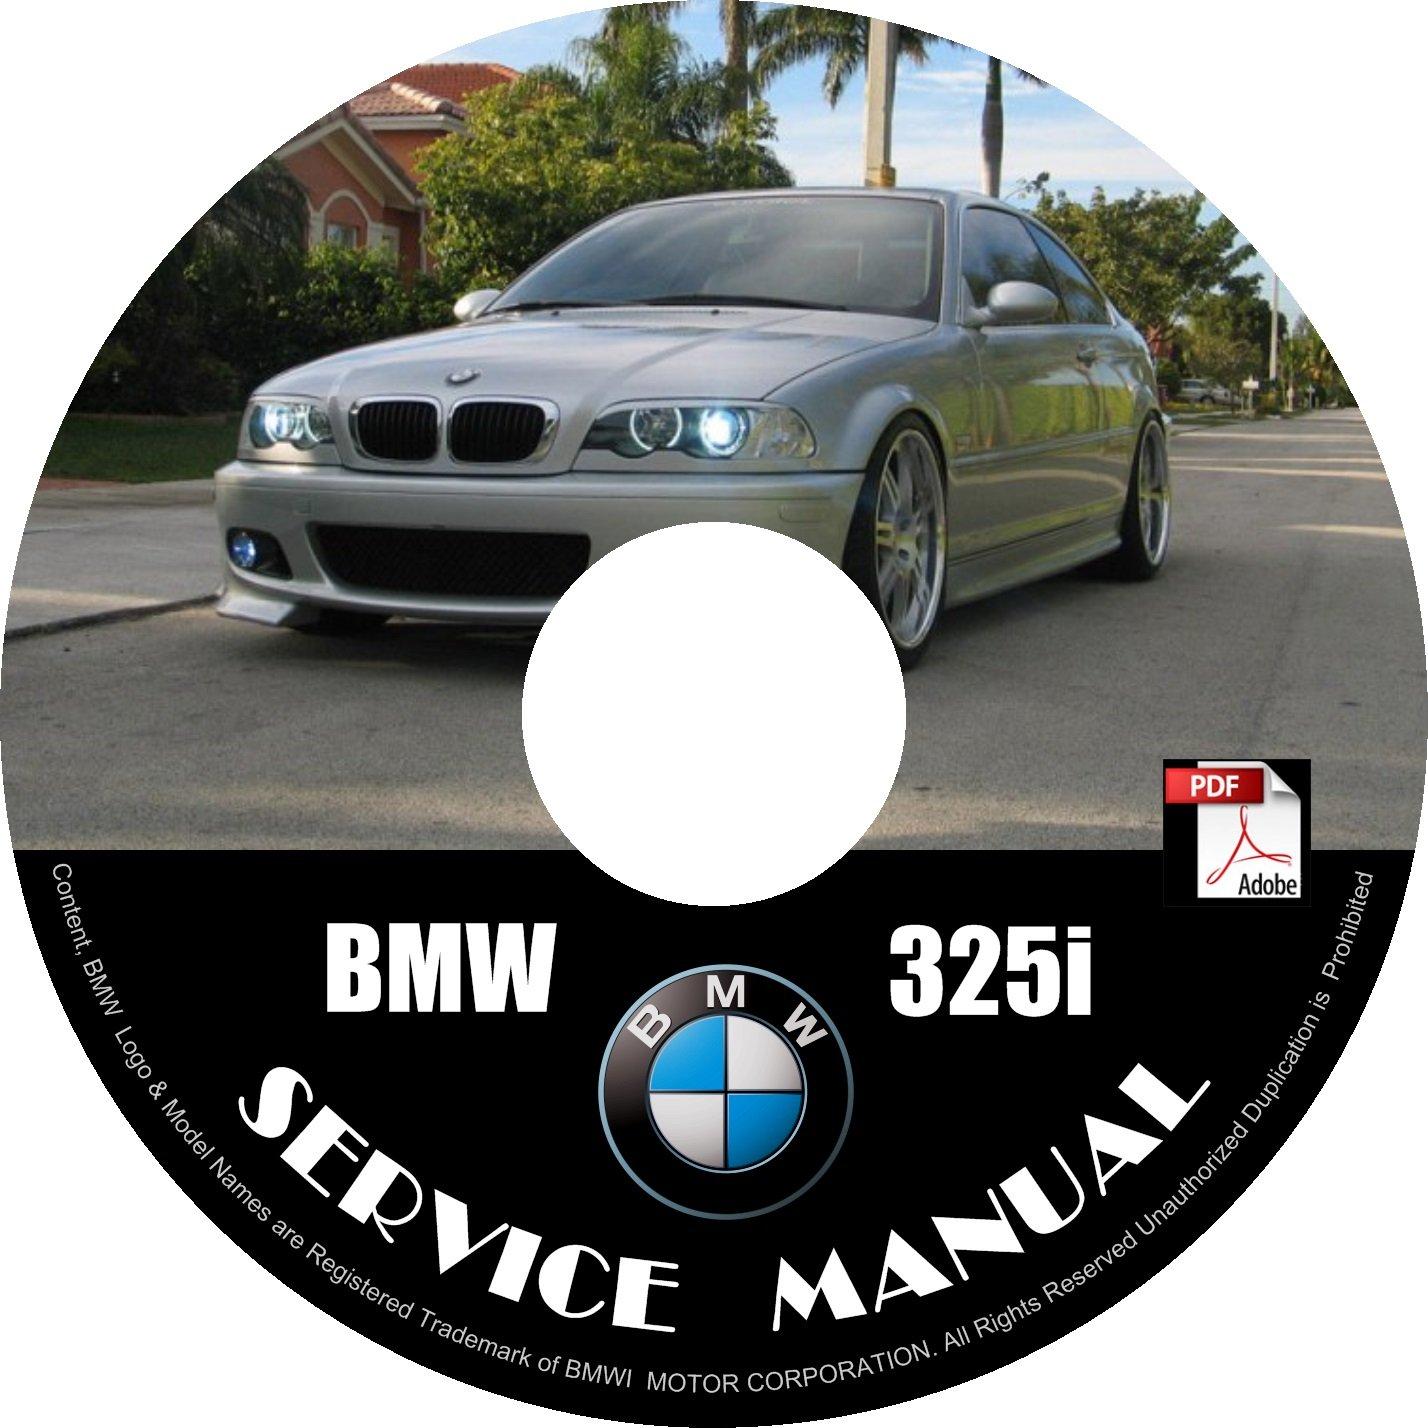 2005 bmw 325i service manual